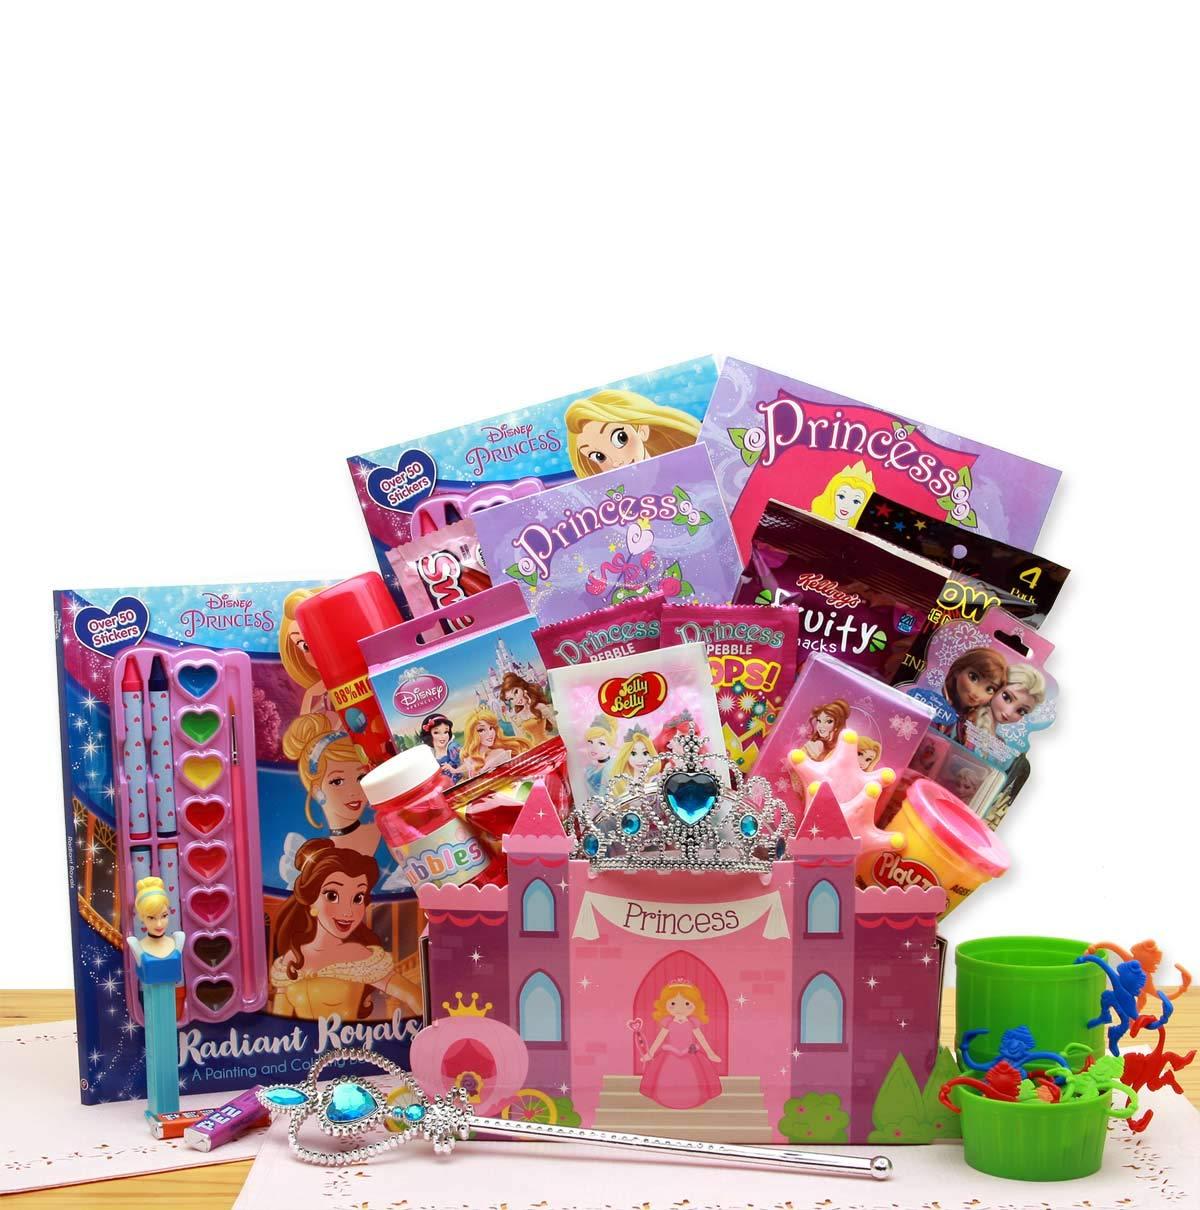 A Princess Fairytale Gift Box